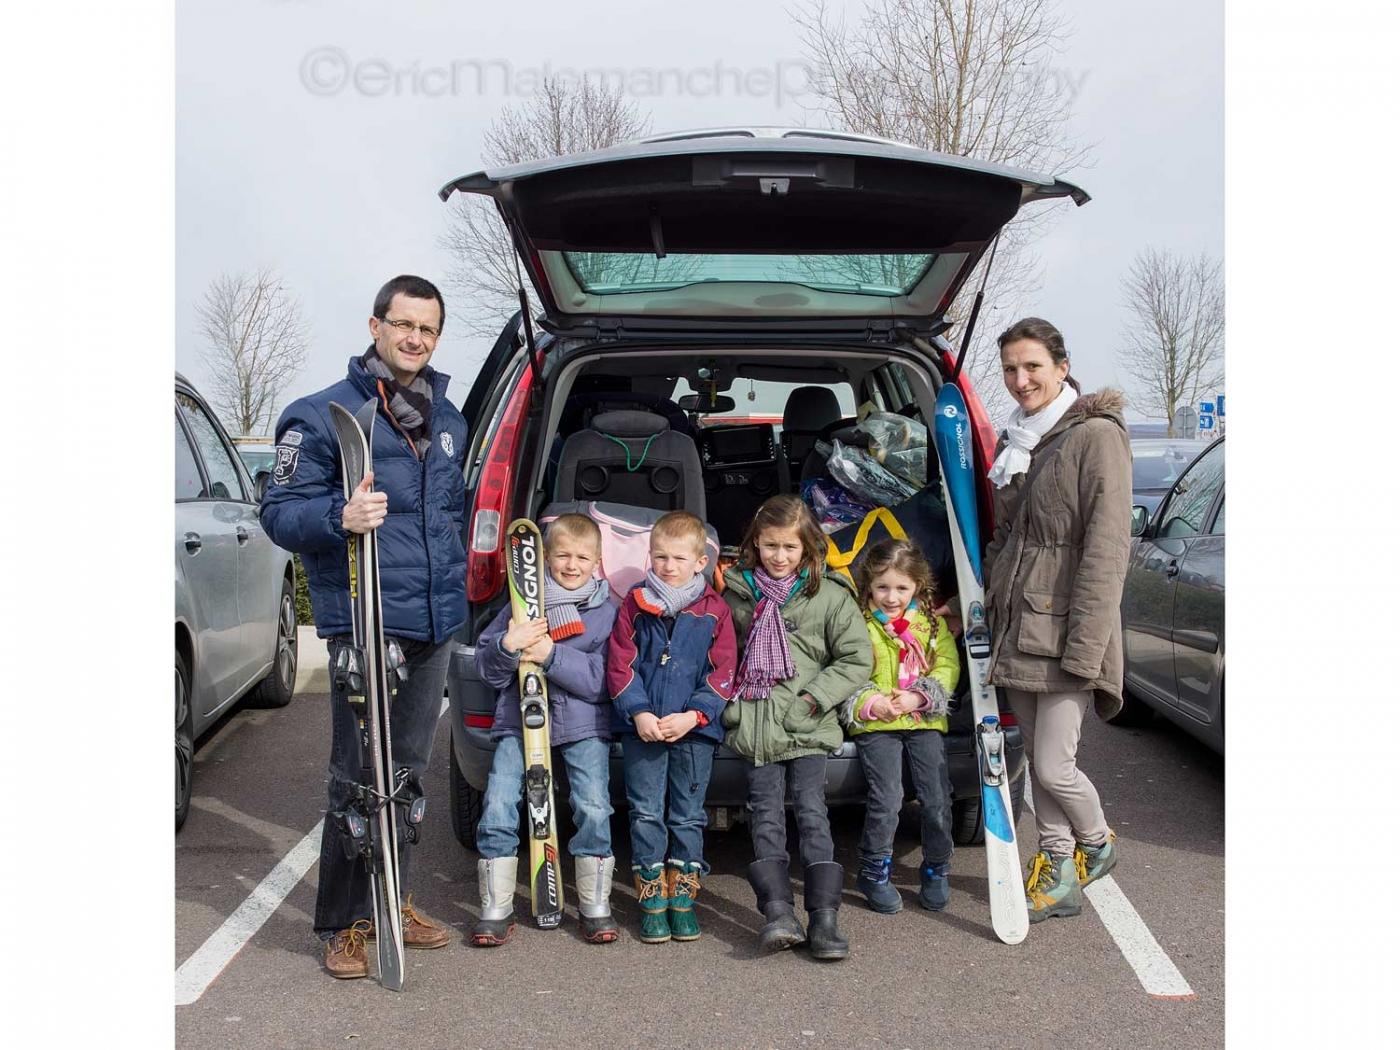 https://www.ericmalemanche.com/imagess/topics/les-conges/liste/grands-departs-ski.jpg